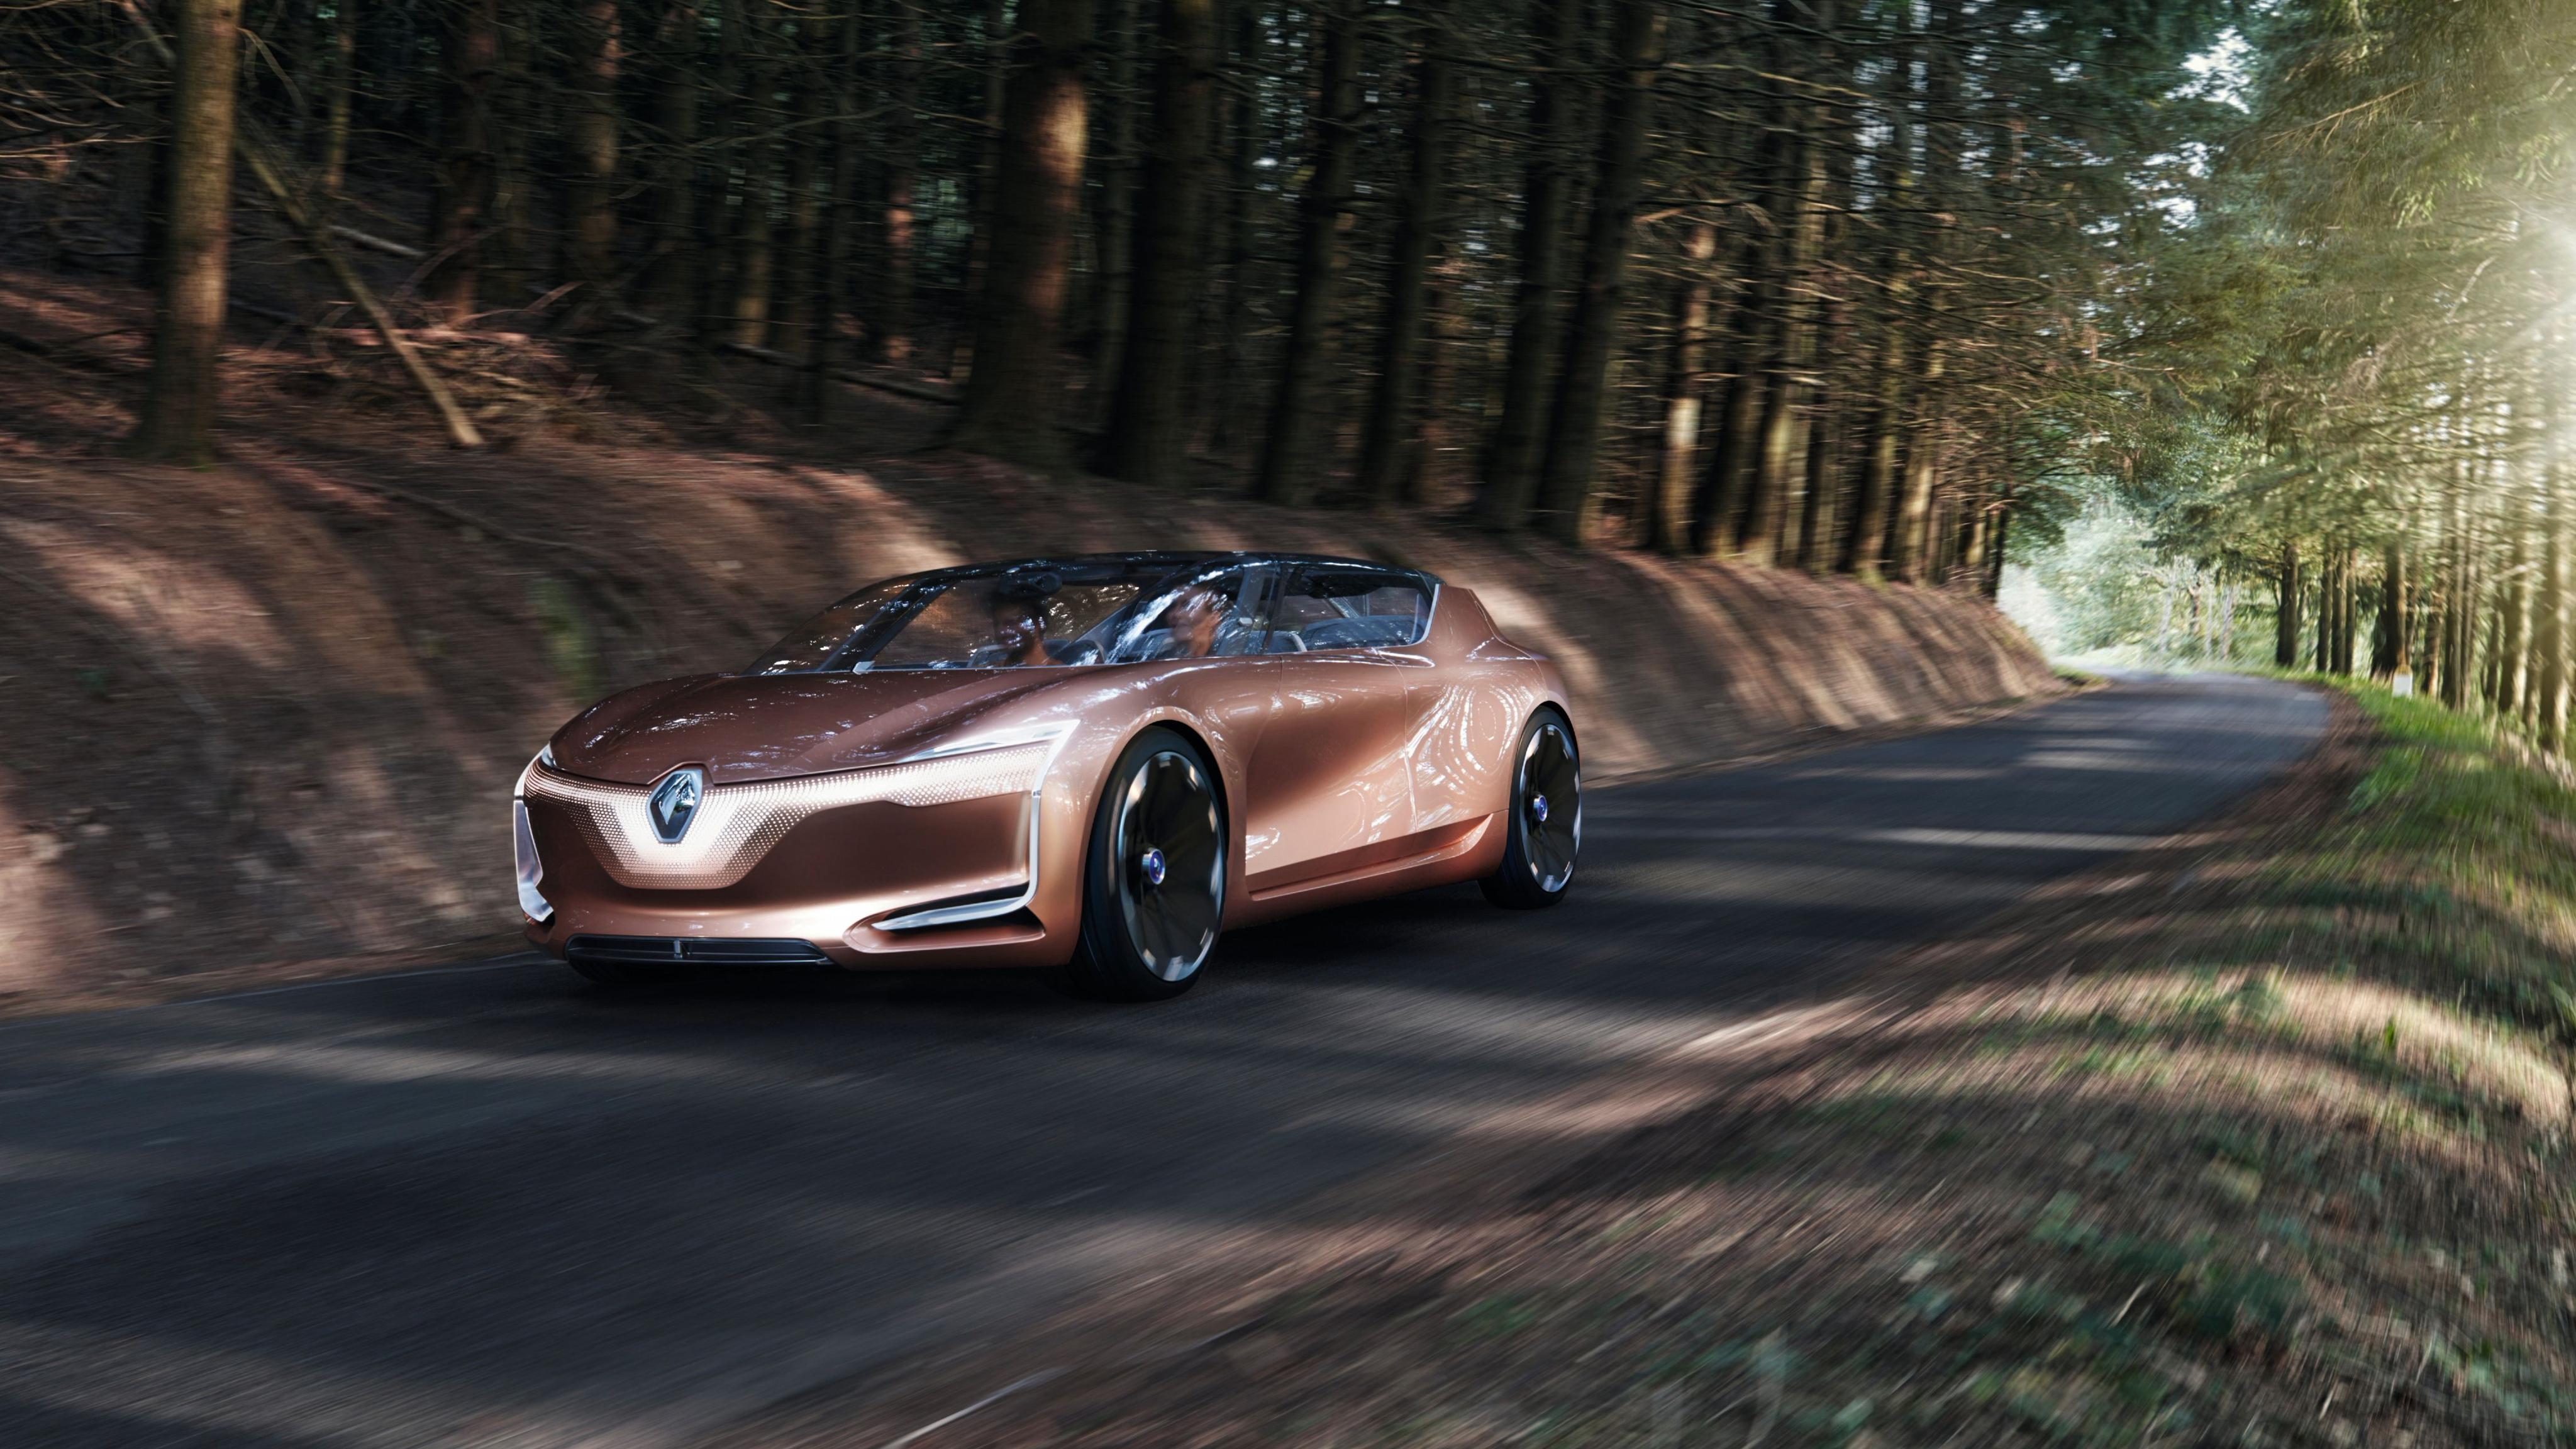 Renault Symbioz Self Driving Electric Car 4k Wallpaper Hd Car Wallpapers Id 8488